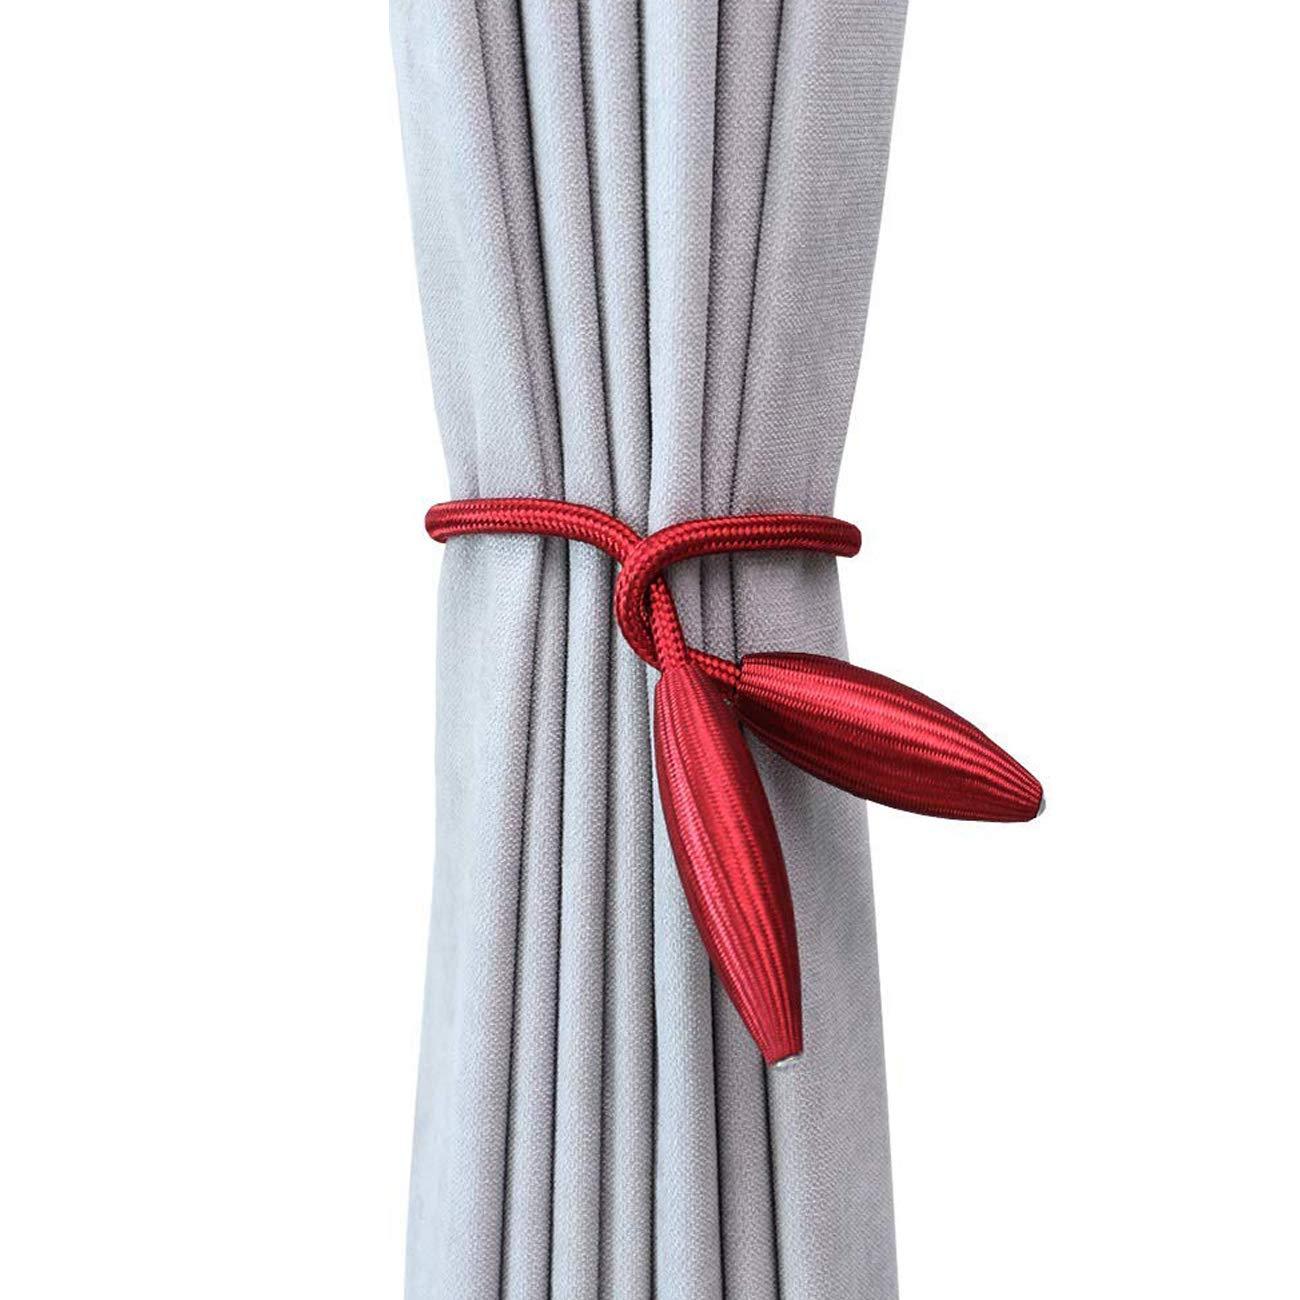 Dark Brown Ogrmar 2PCS Curtain Window Tiebacks//Random Modeling Drapery Tie Backs//Decorative Rope Holdbacks for Window Blackout and Sheer Panels No Need Drilling